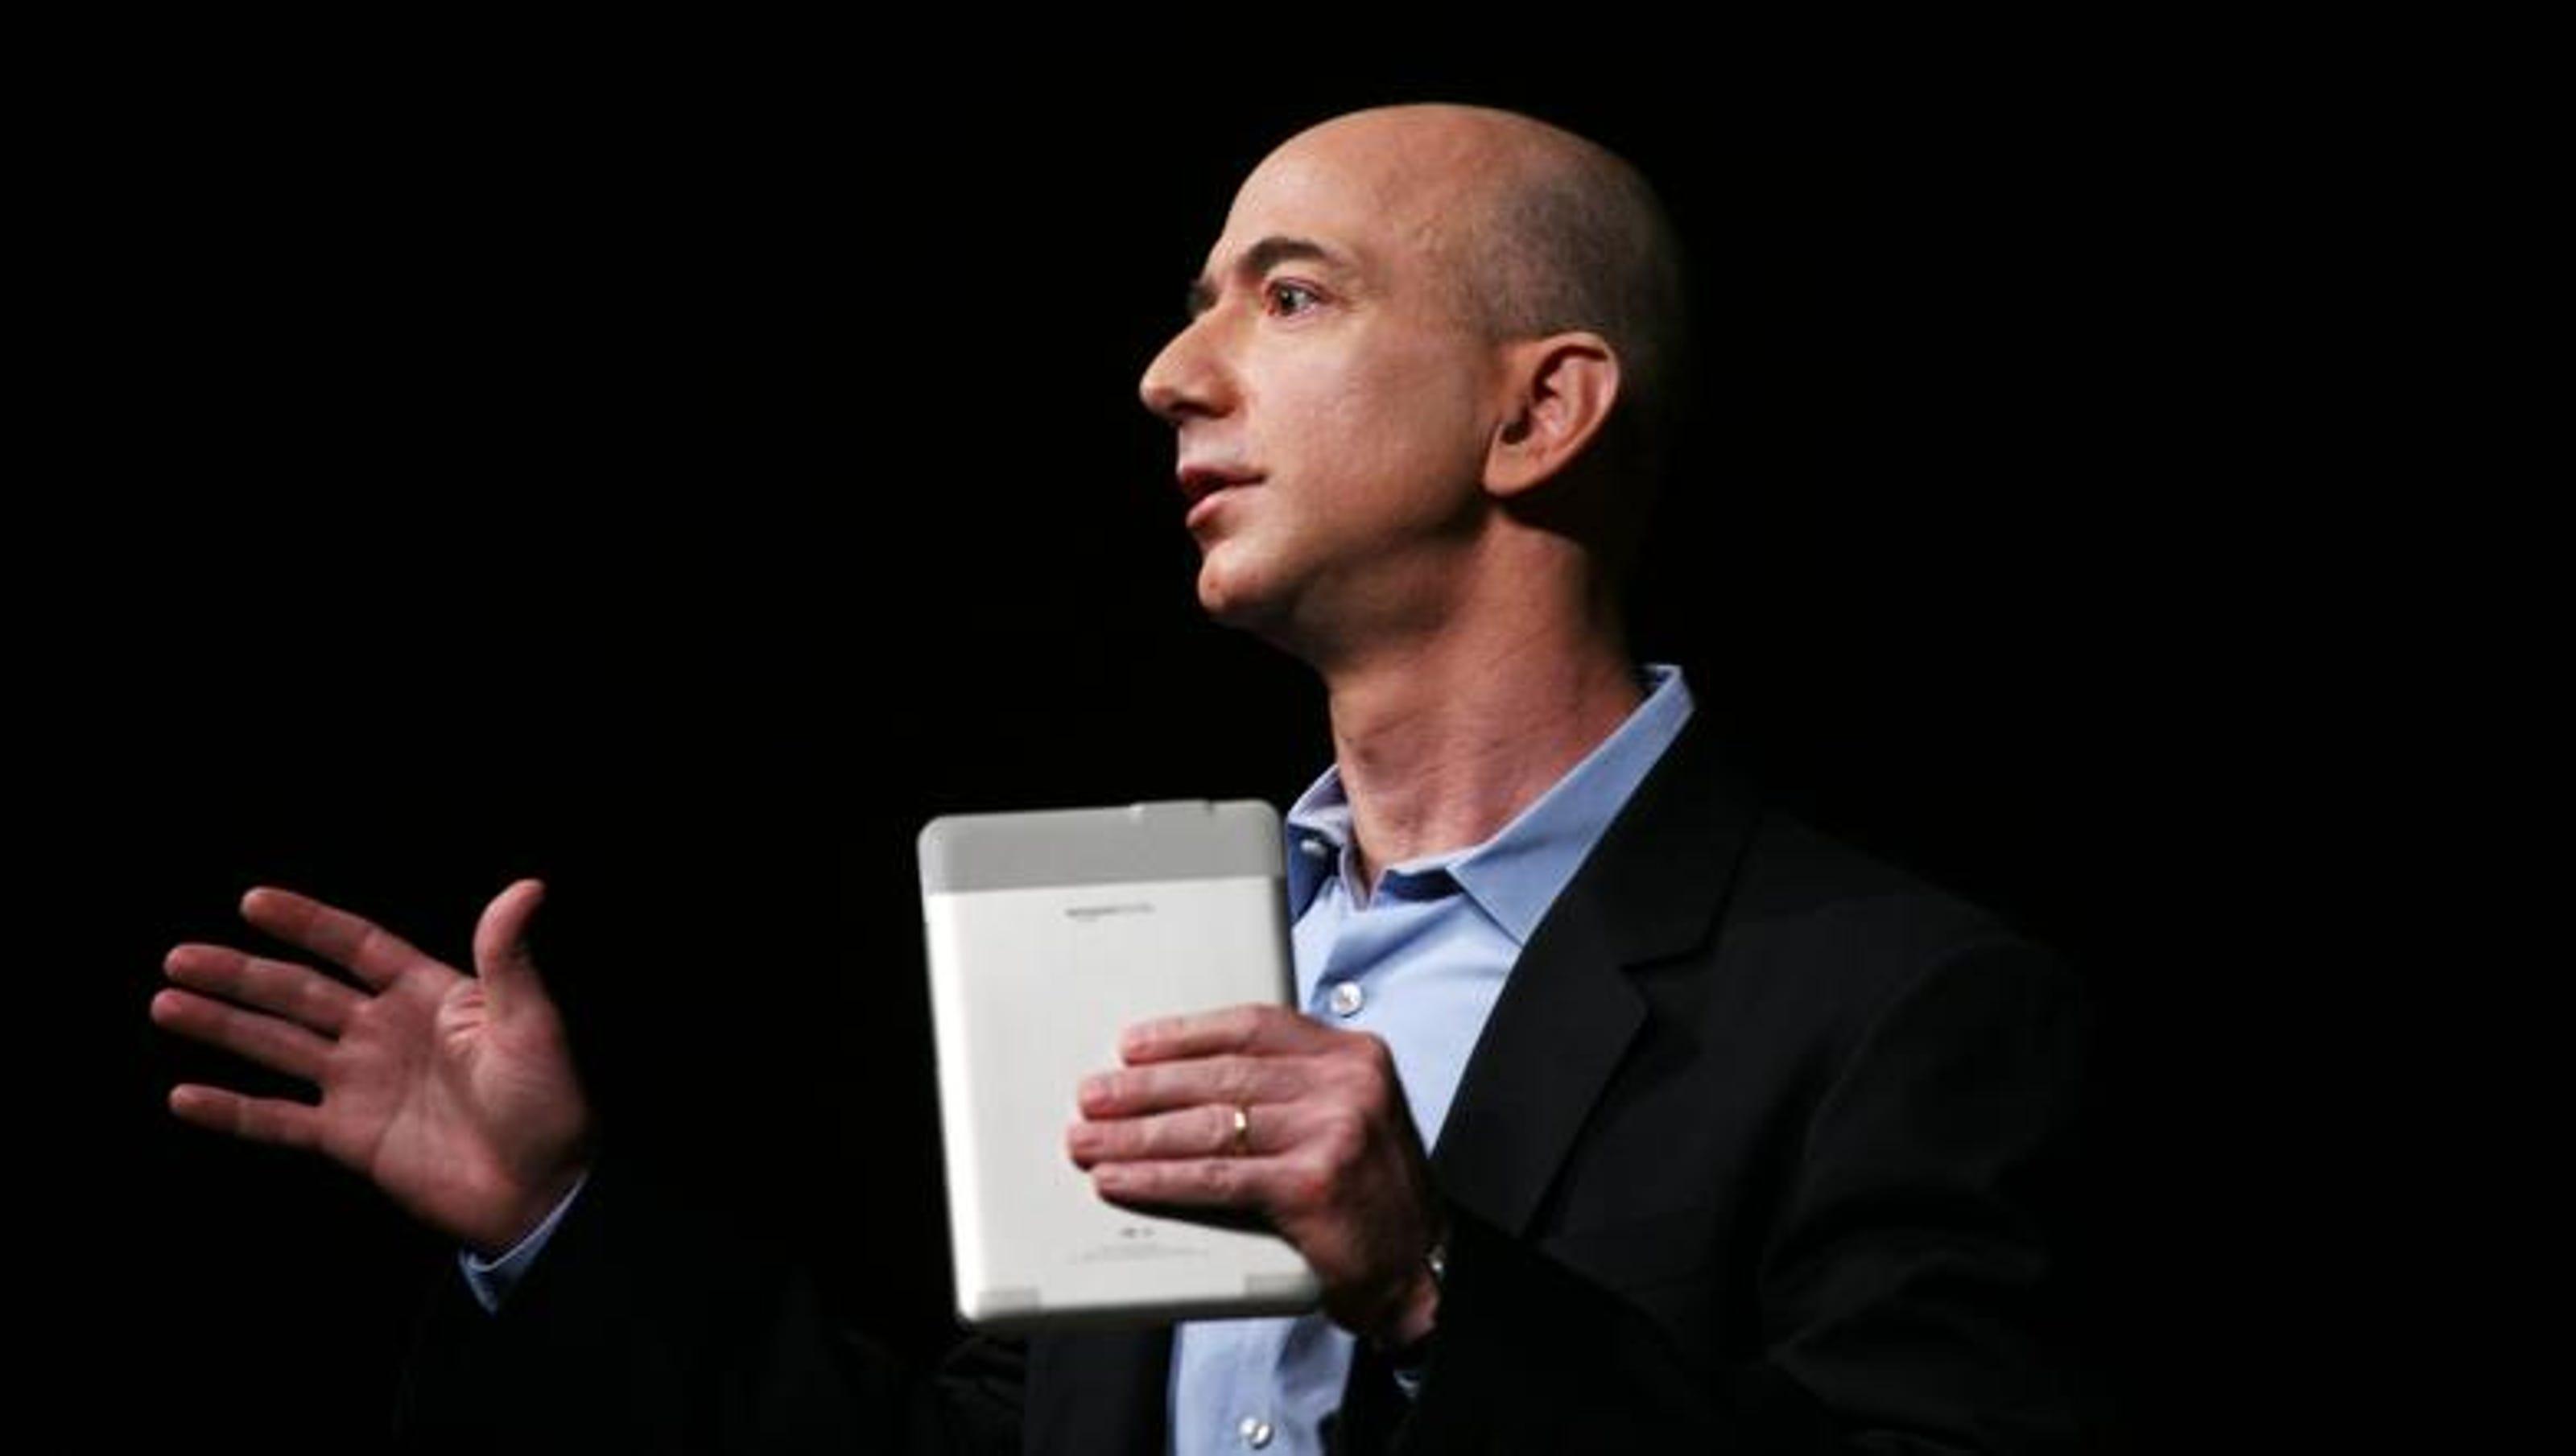 Jeff Bezos Shares Thoughts On Washington Post Purchase Amazon Products